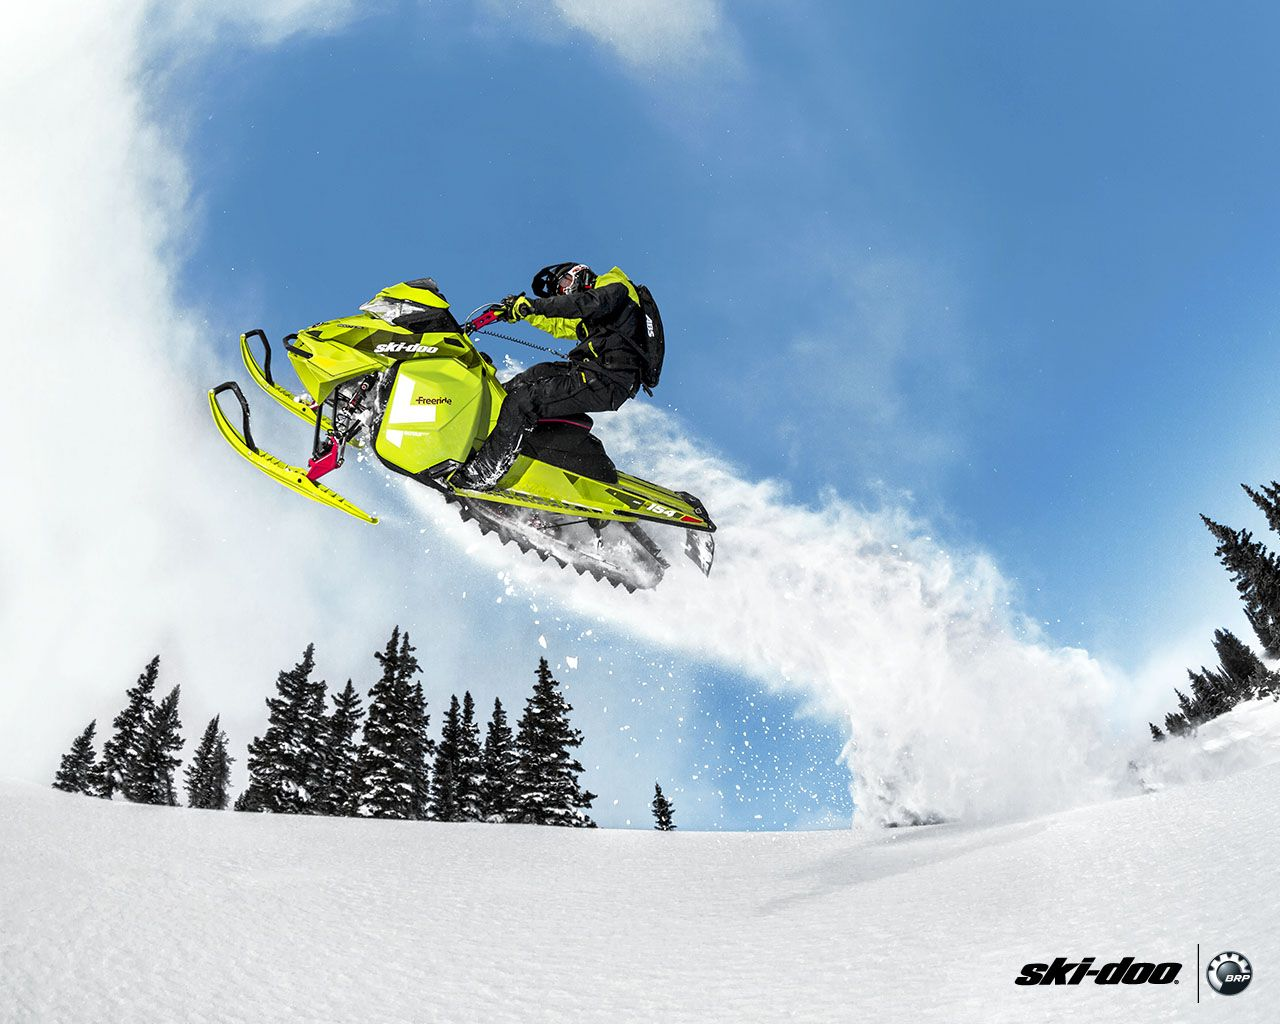 2015 Ski Doo Freeride 154   Reviews Price Specs 1280x1024